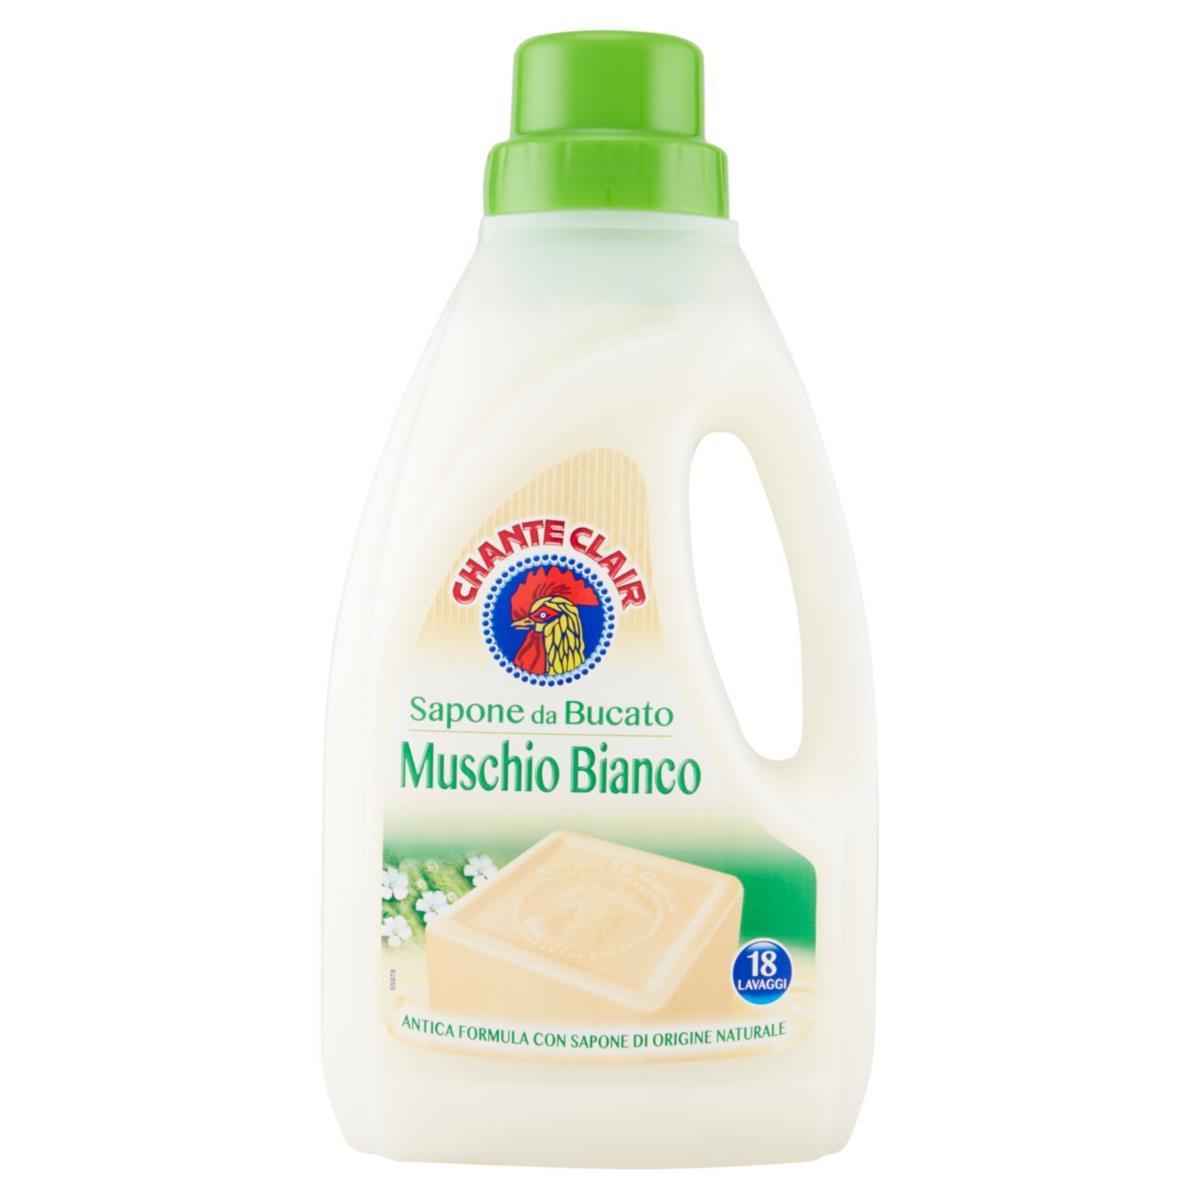 Chante Clair Muschio Bianco, prací tekuté mýdlo bílý mošus 1 l., 18 pracích dávek